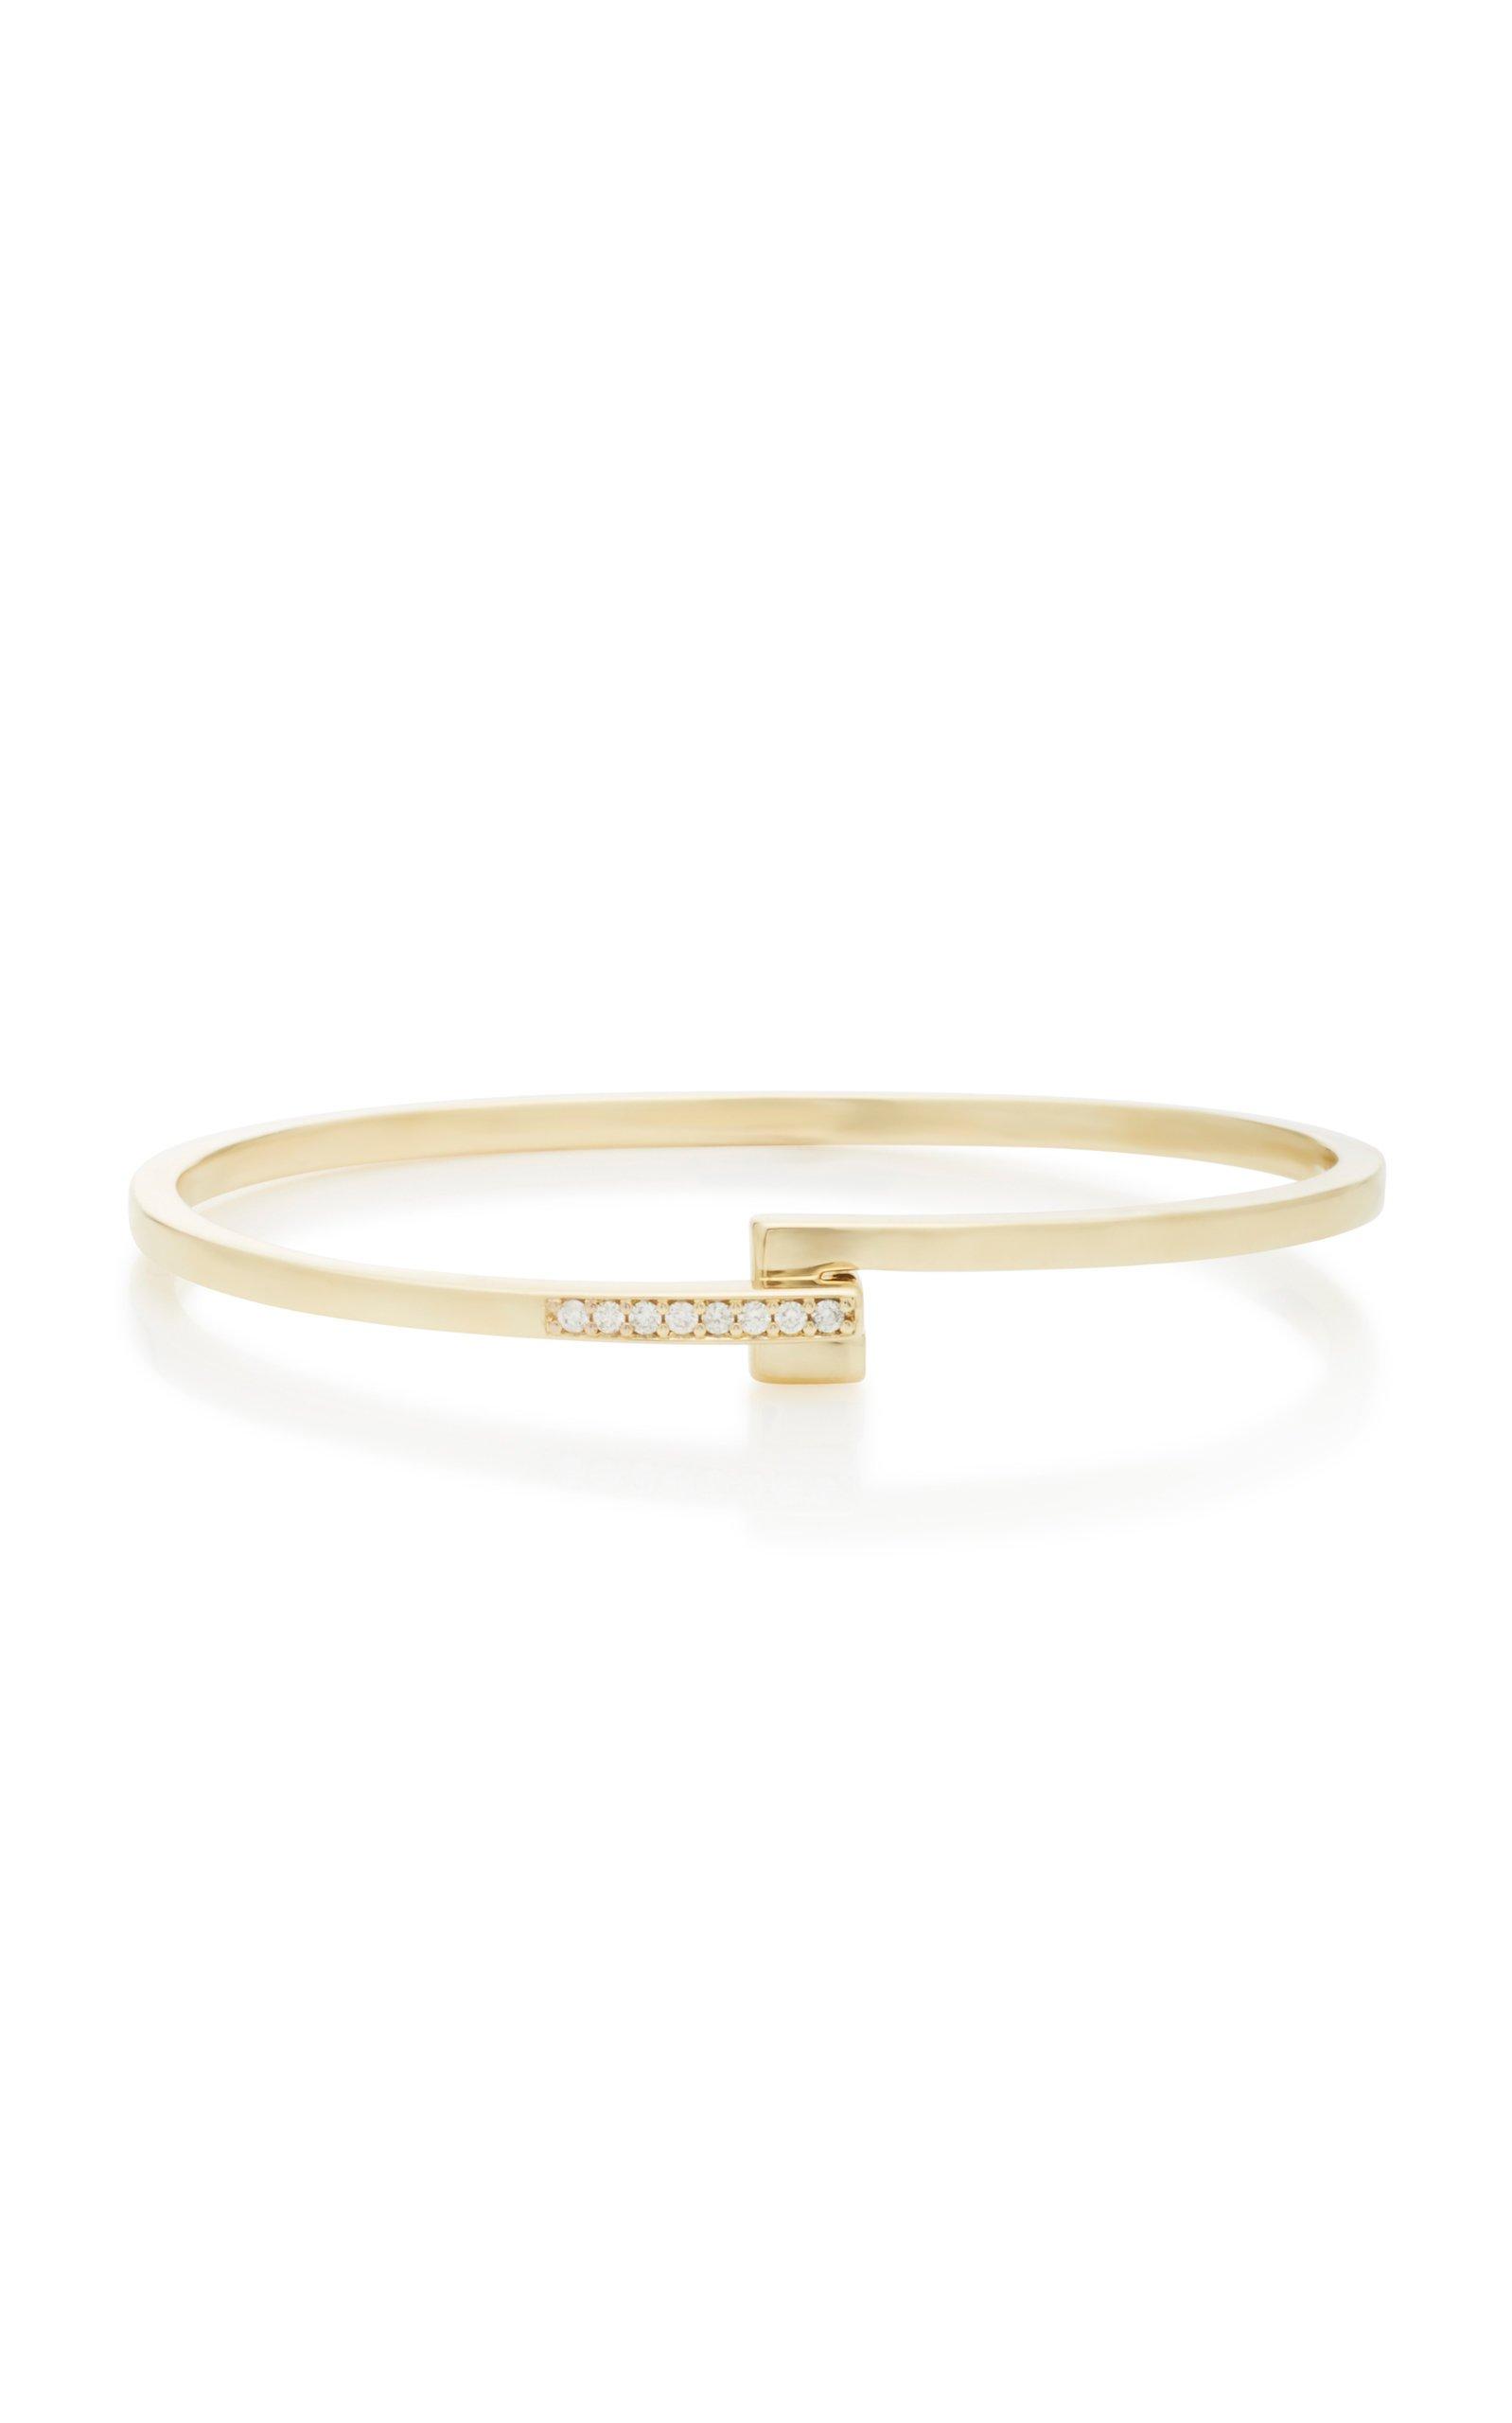 MIANSAI Cubist 14K Gold Diamond Bracelet